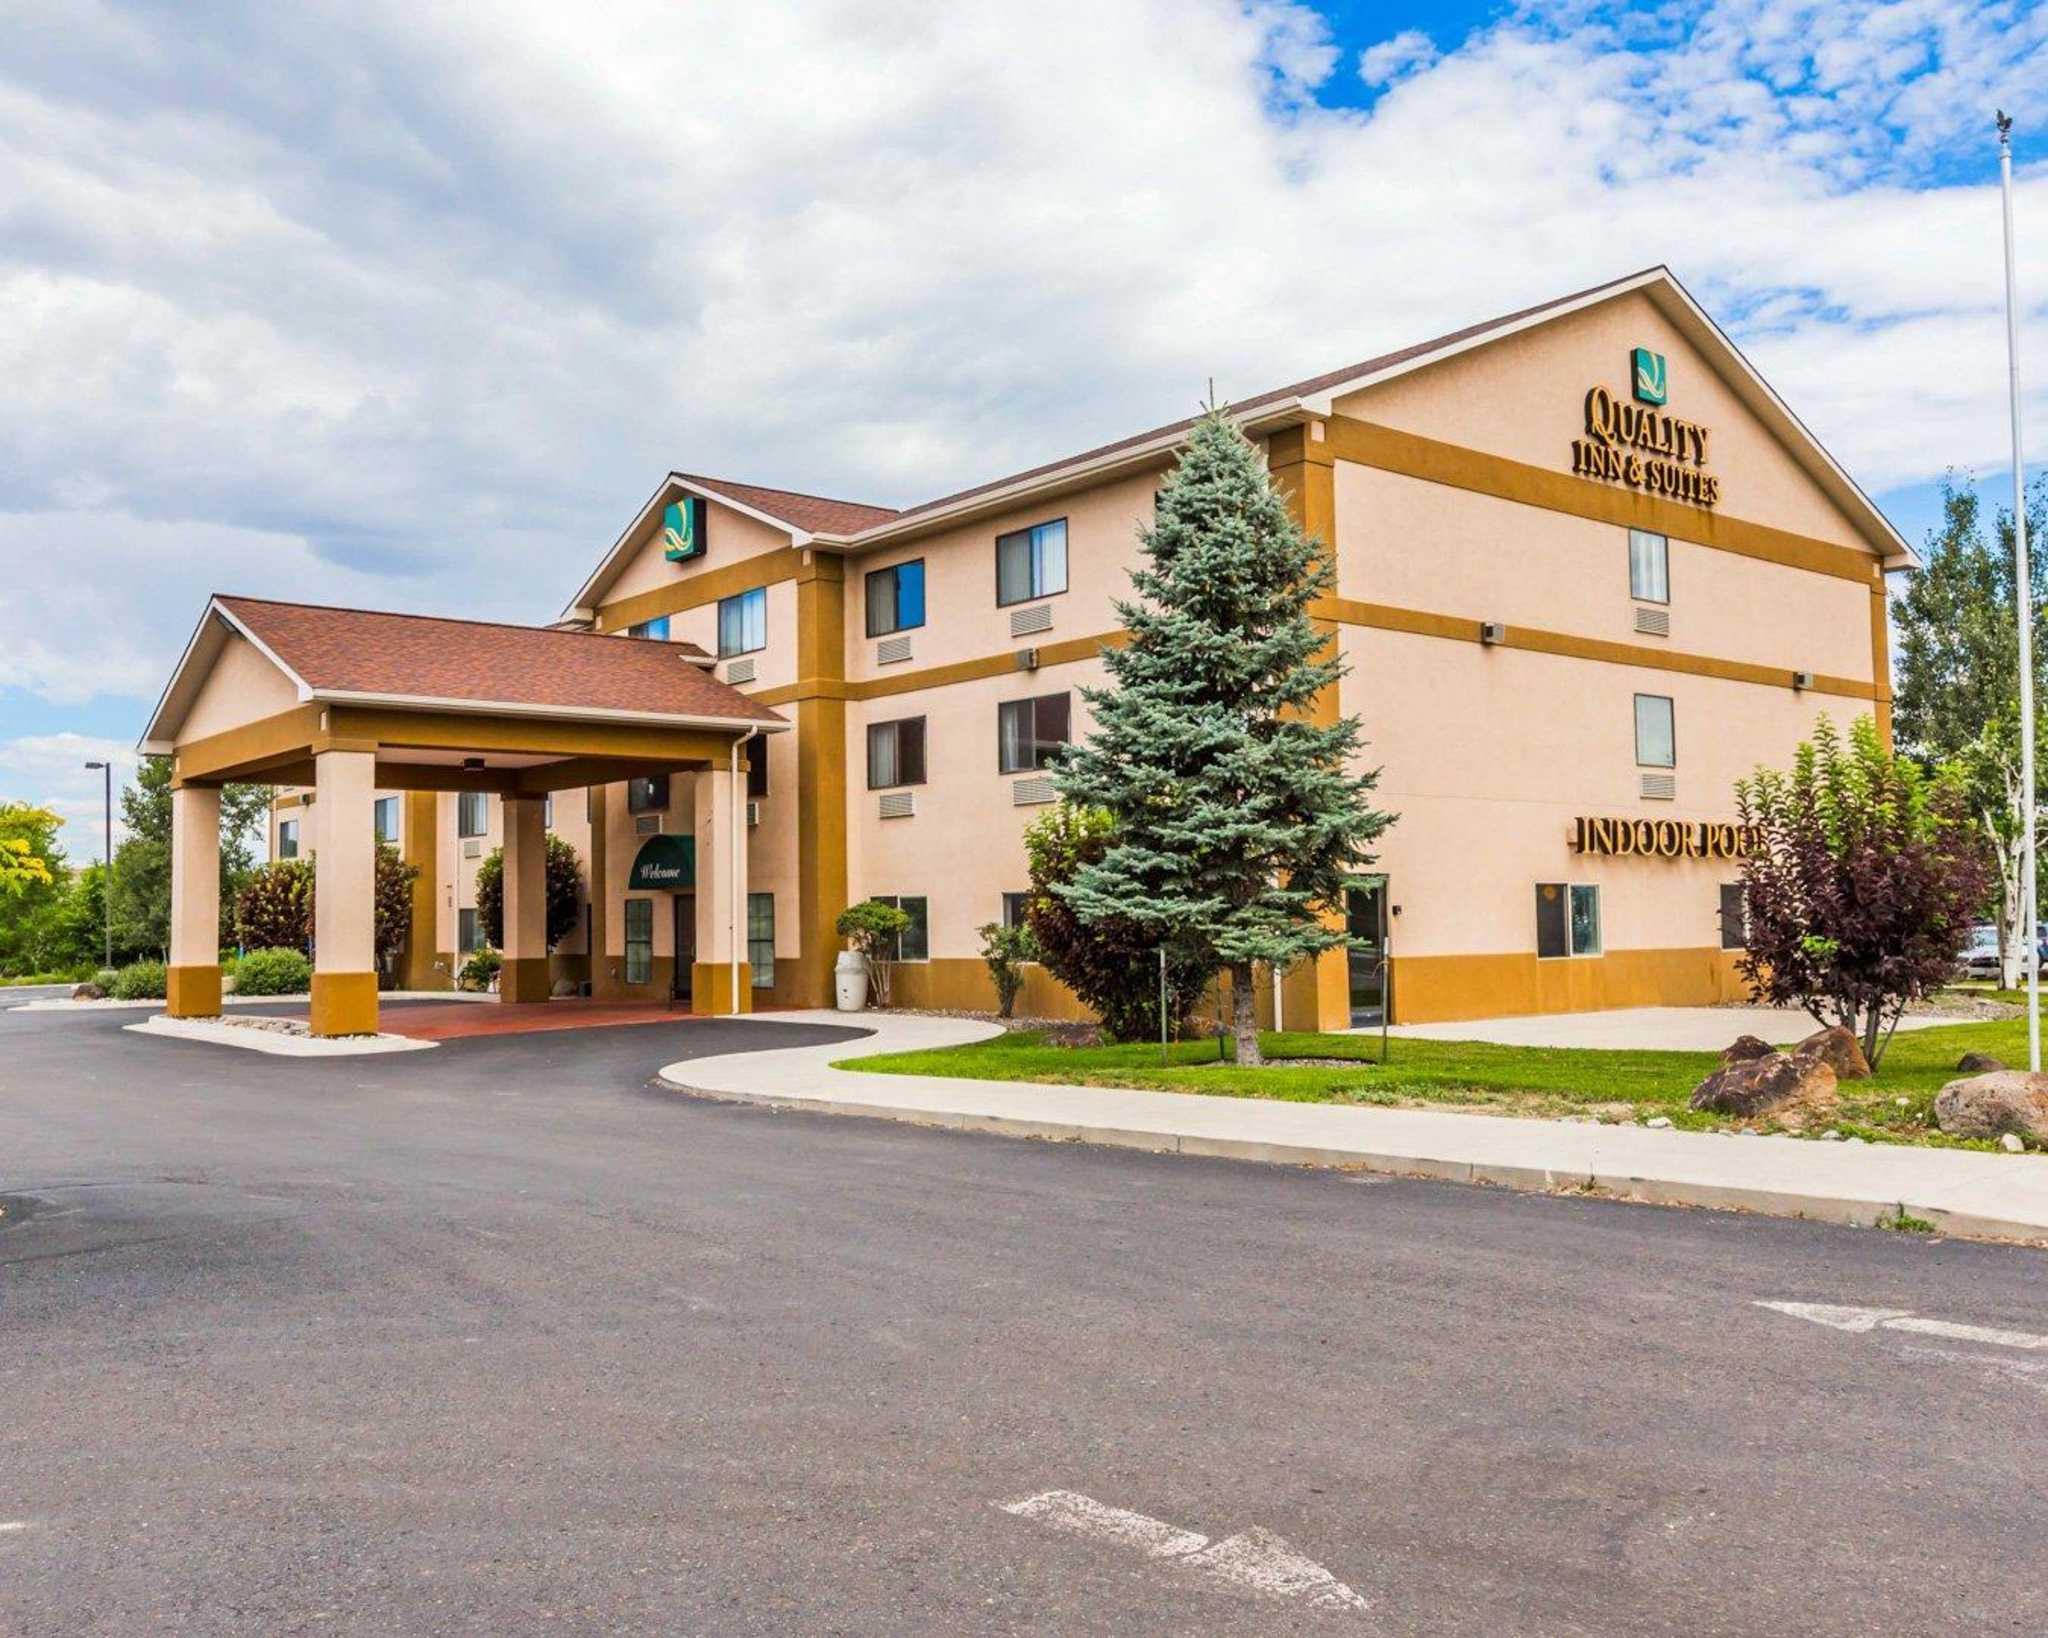 Cheap Motels In Glenwood Springs Co